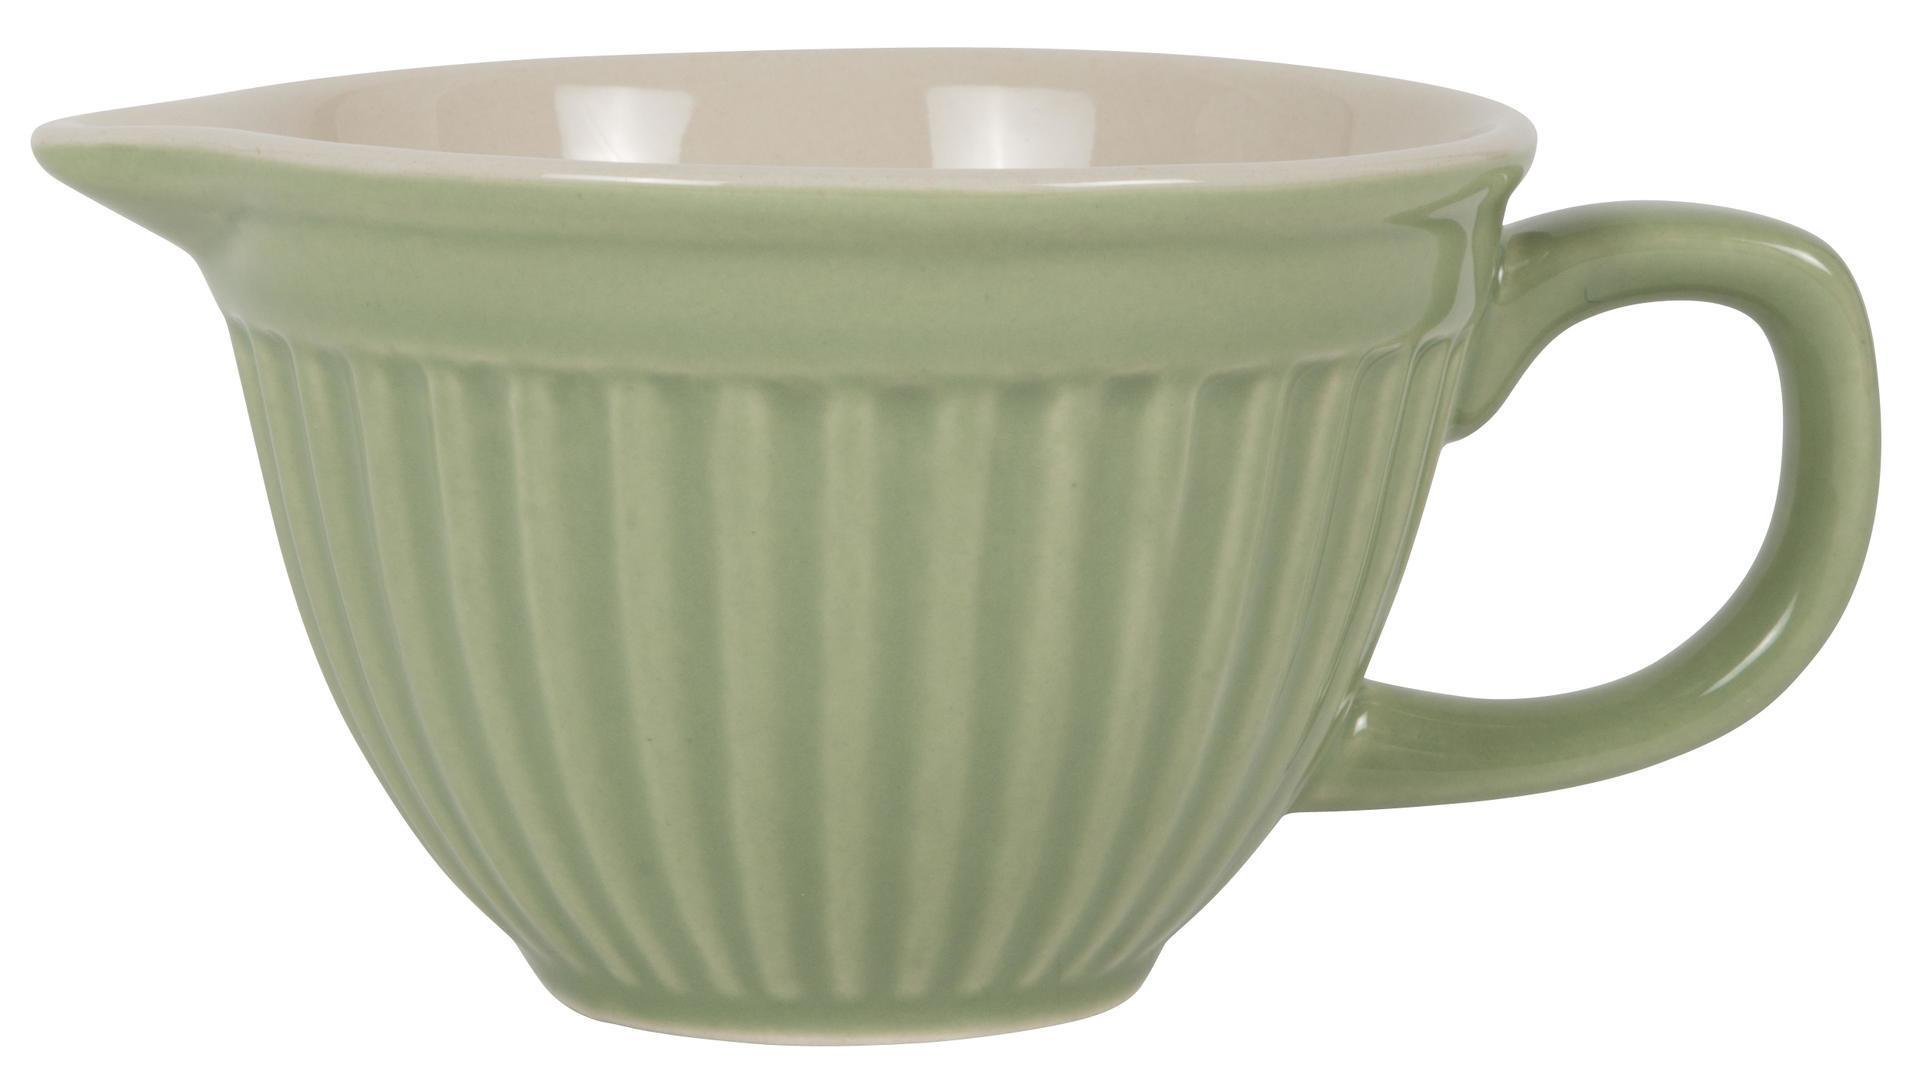 IB LAURSEN Mini mísa na těsto Mynte Meadow green, zelená barva, keramika